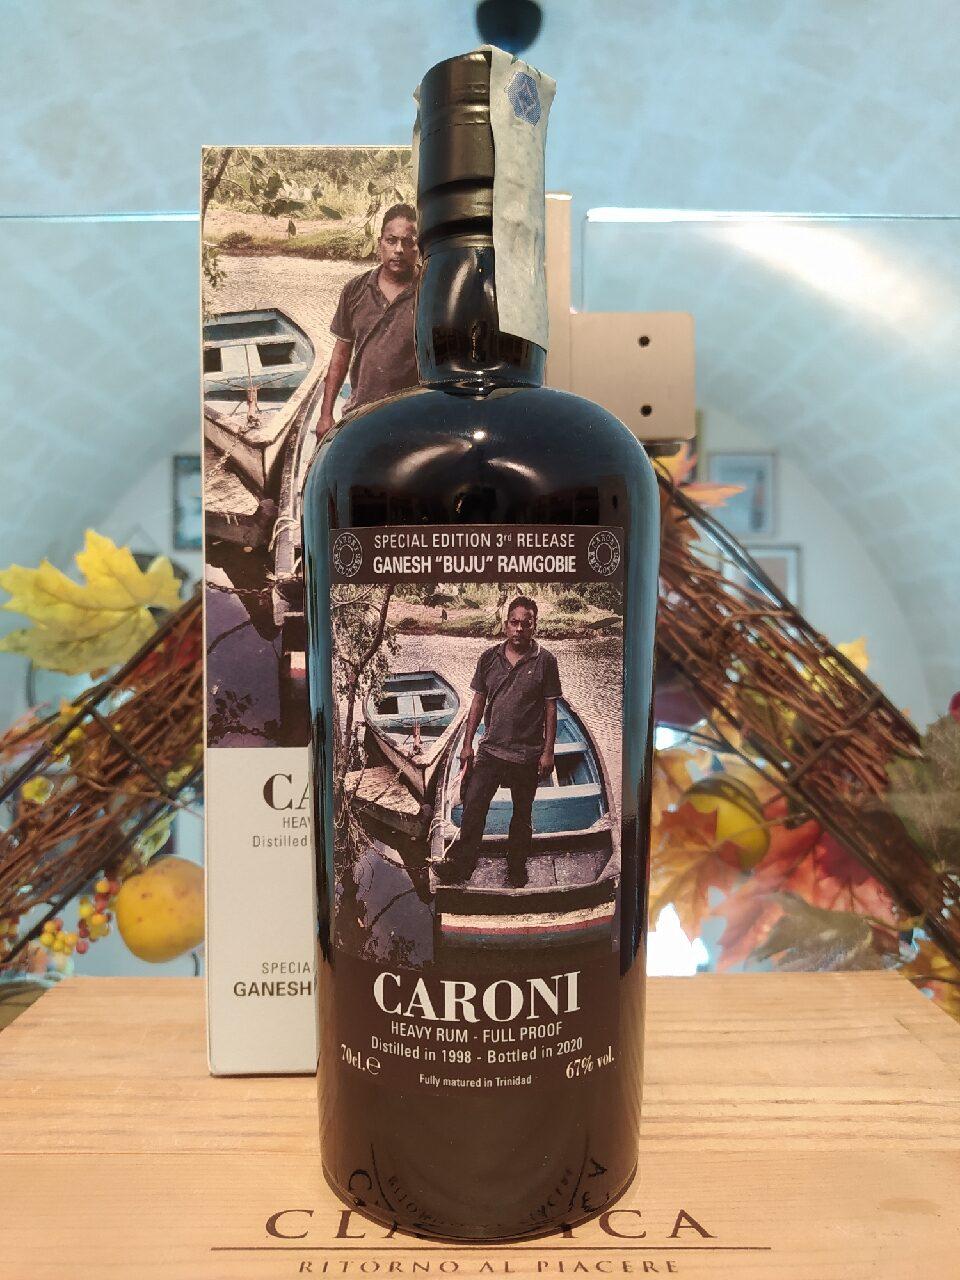 Caroni Heavy Rum Ganesh Buju Ramgobie Employees 3rd Release 1998